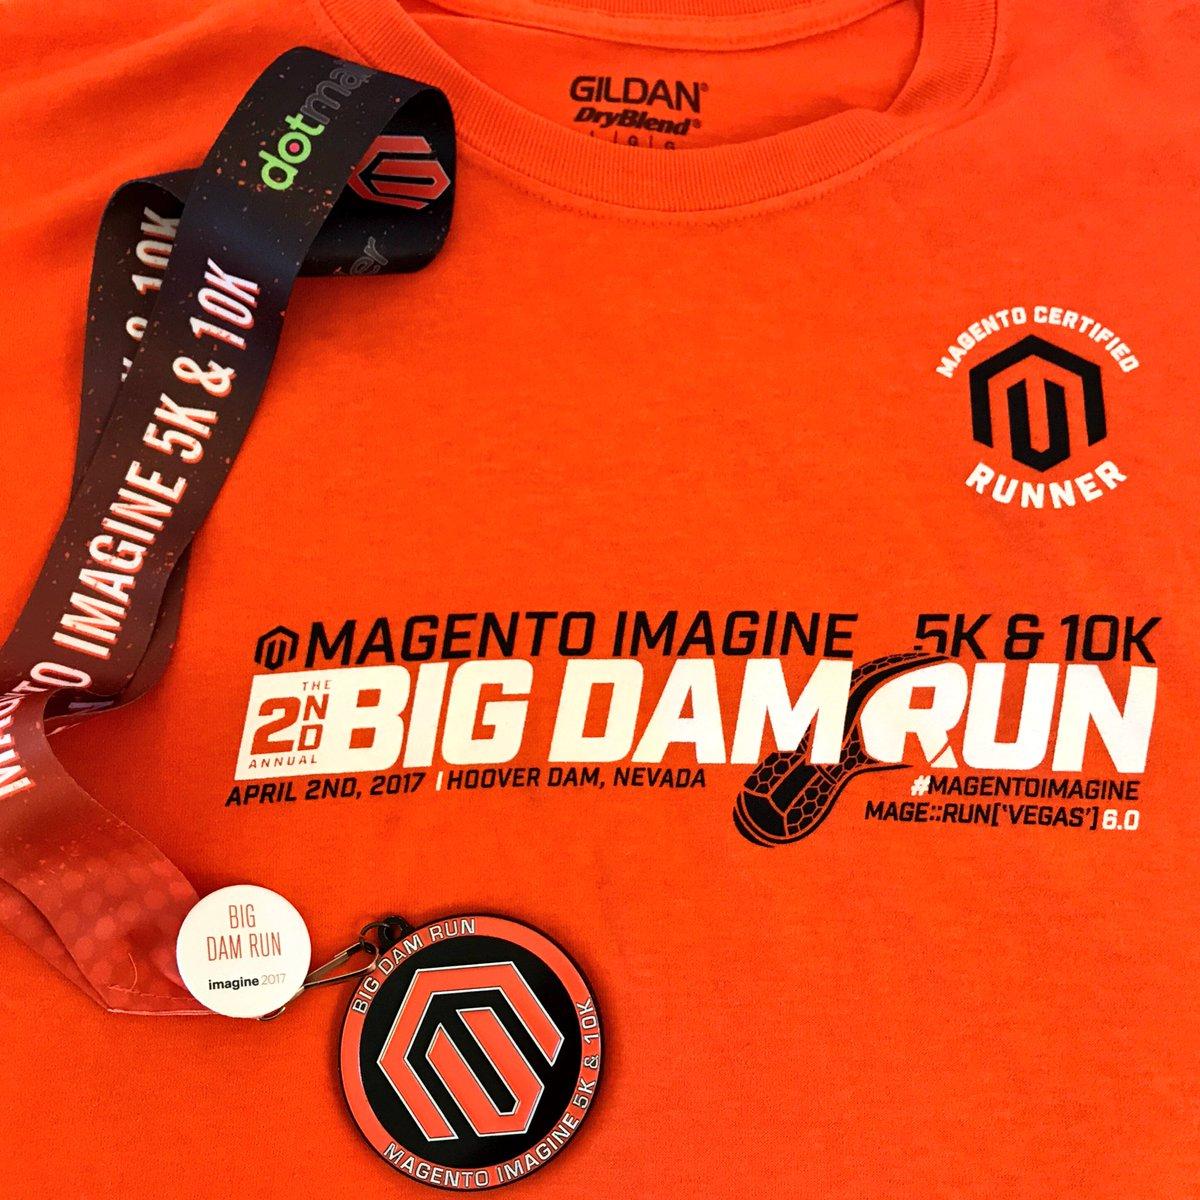 socialshark: @wagento Love the tee and finishers medal from the #bigdamrun! #Magentoimagine 🏃🏻 https://t.co/wrthBkAP6j